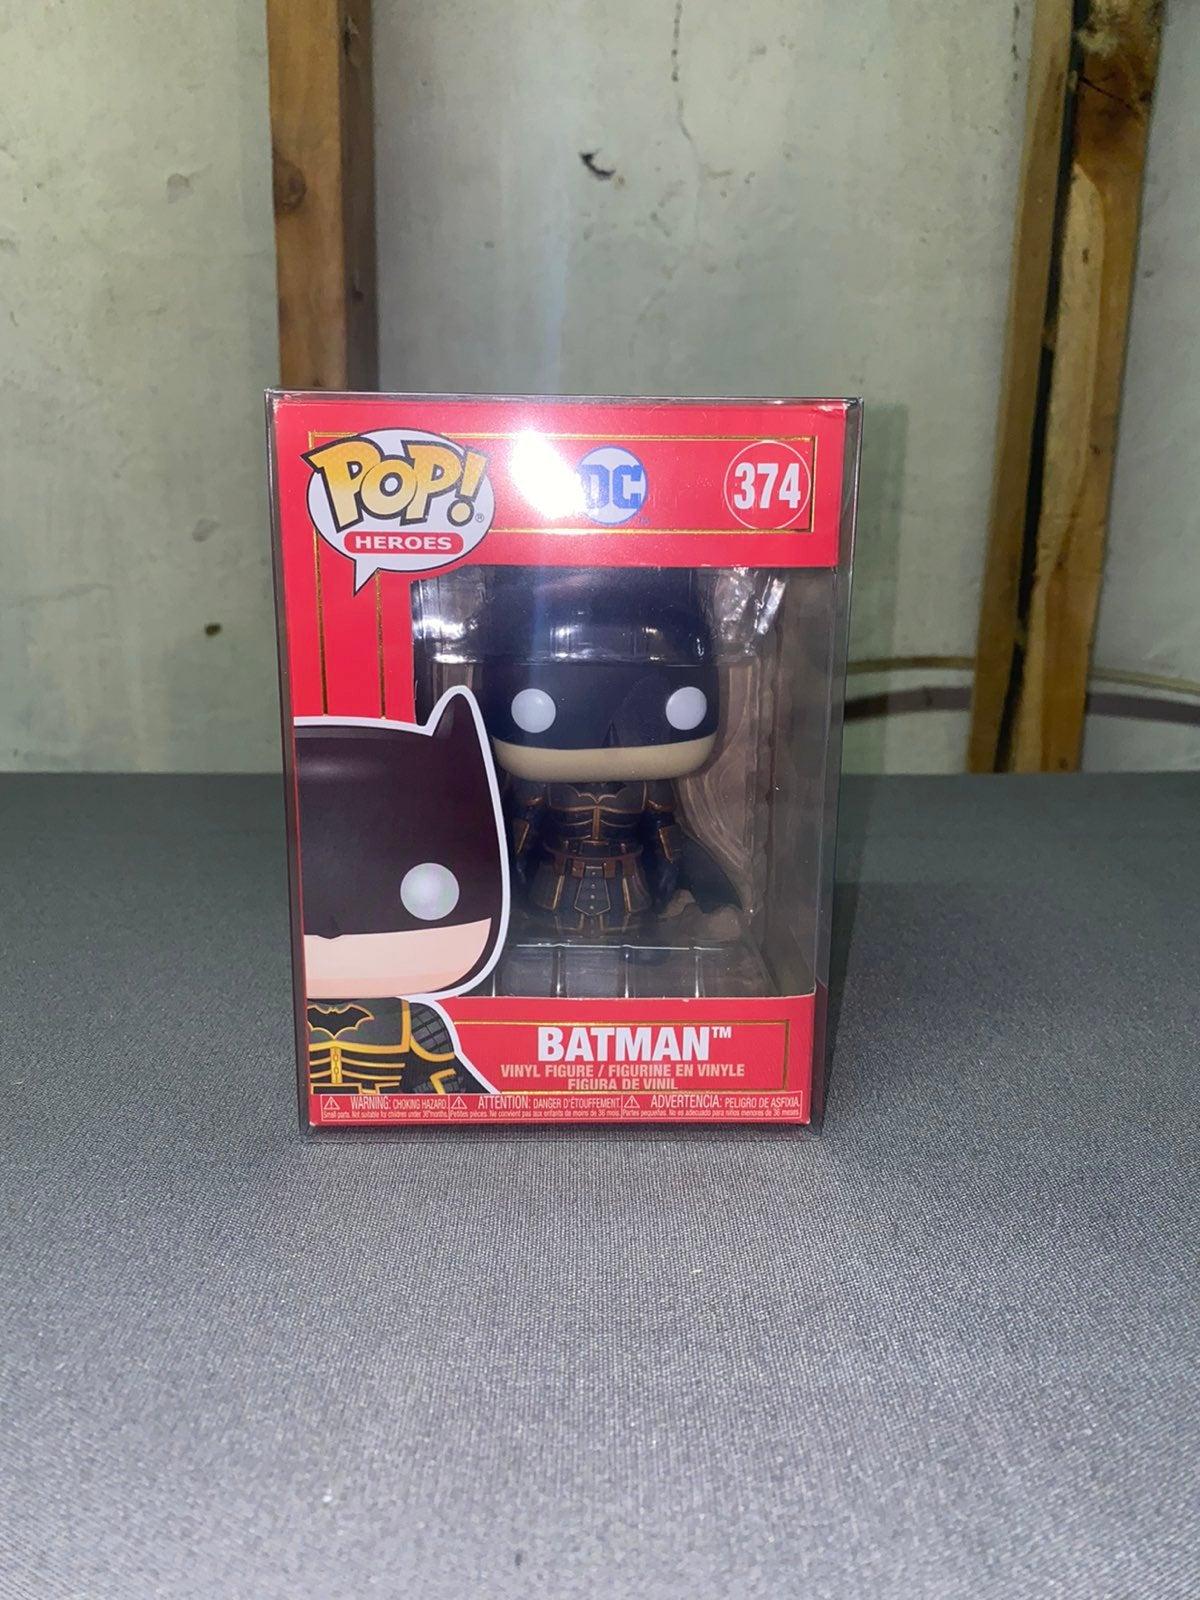 Batman Imperial Palace Funko Pop